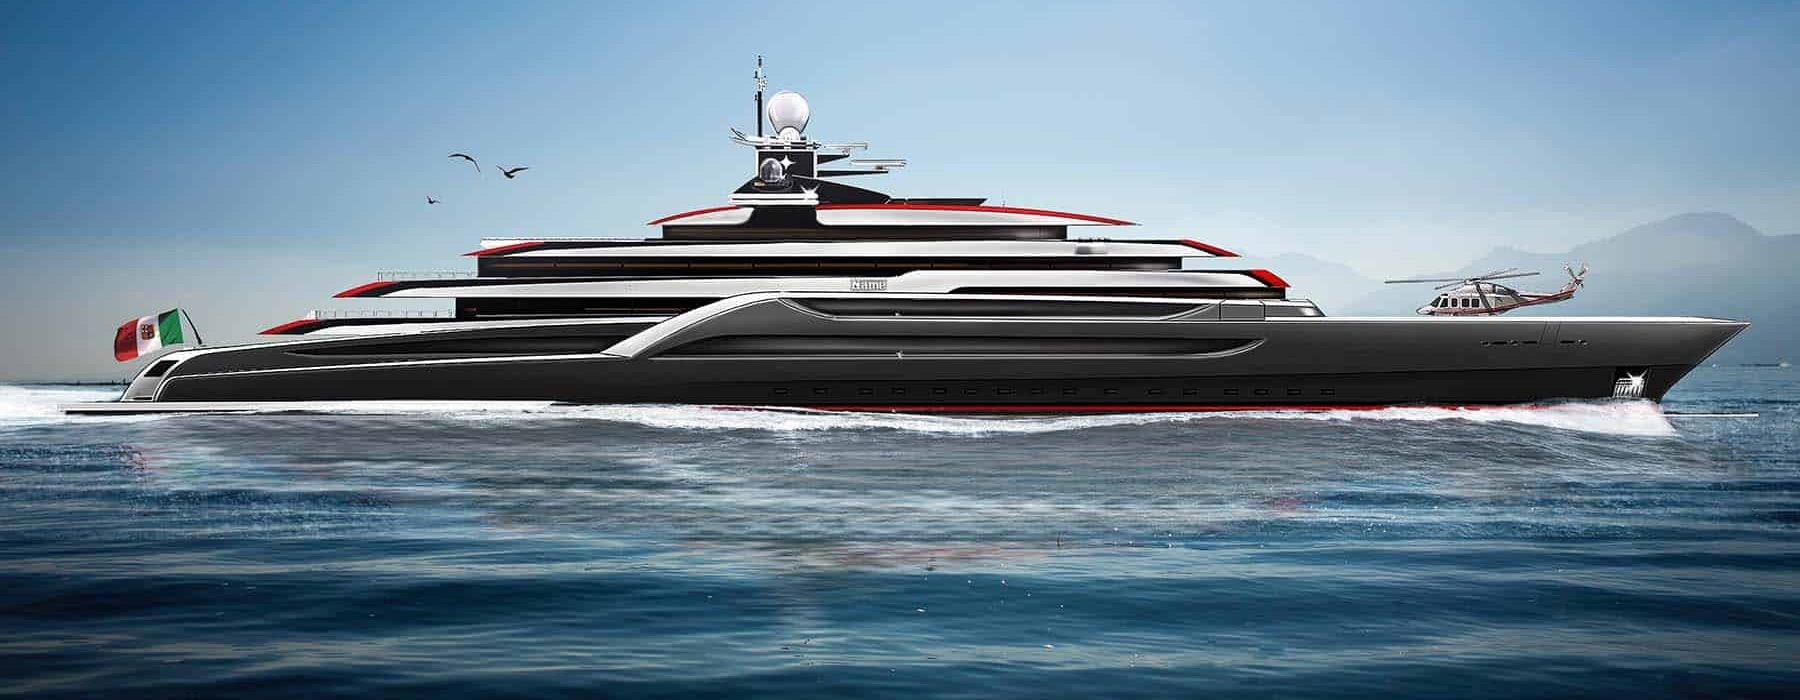 Megayacht TESTAROSSA Lurssen 116m new build project